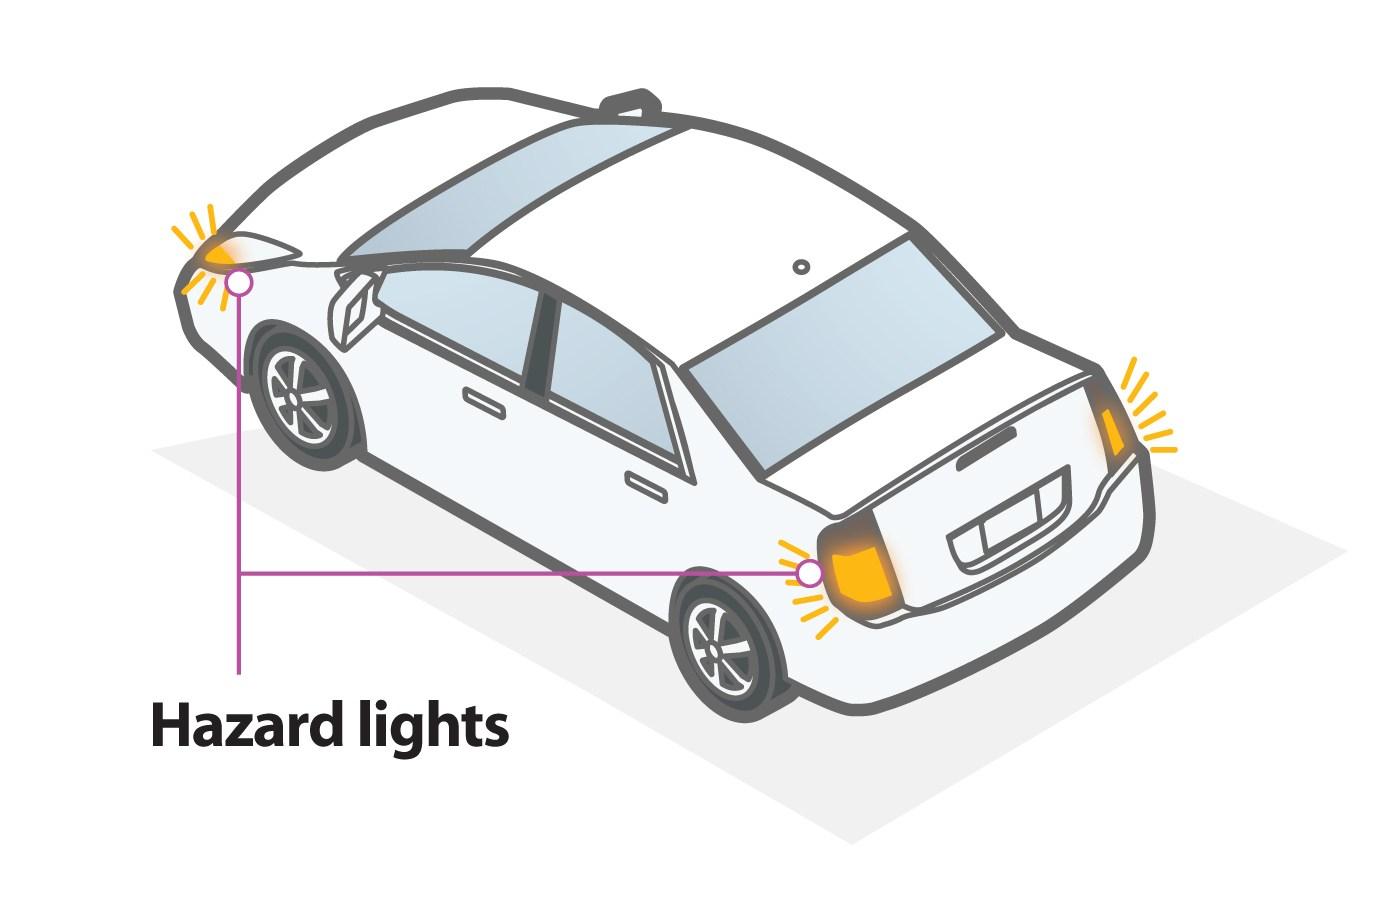 P6-Hazard-lights.jpg